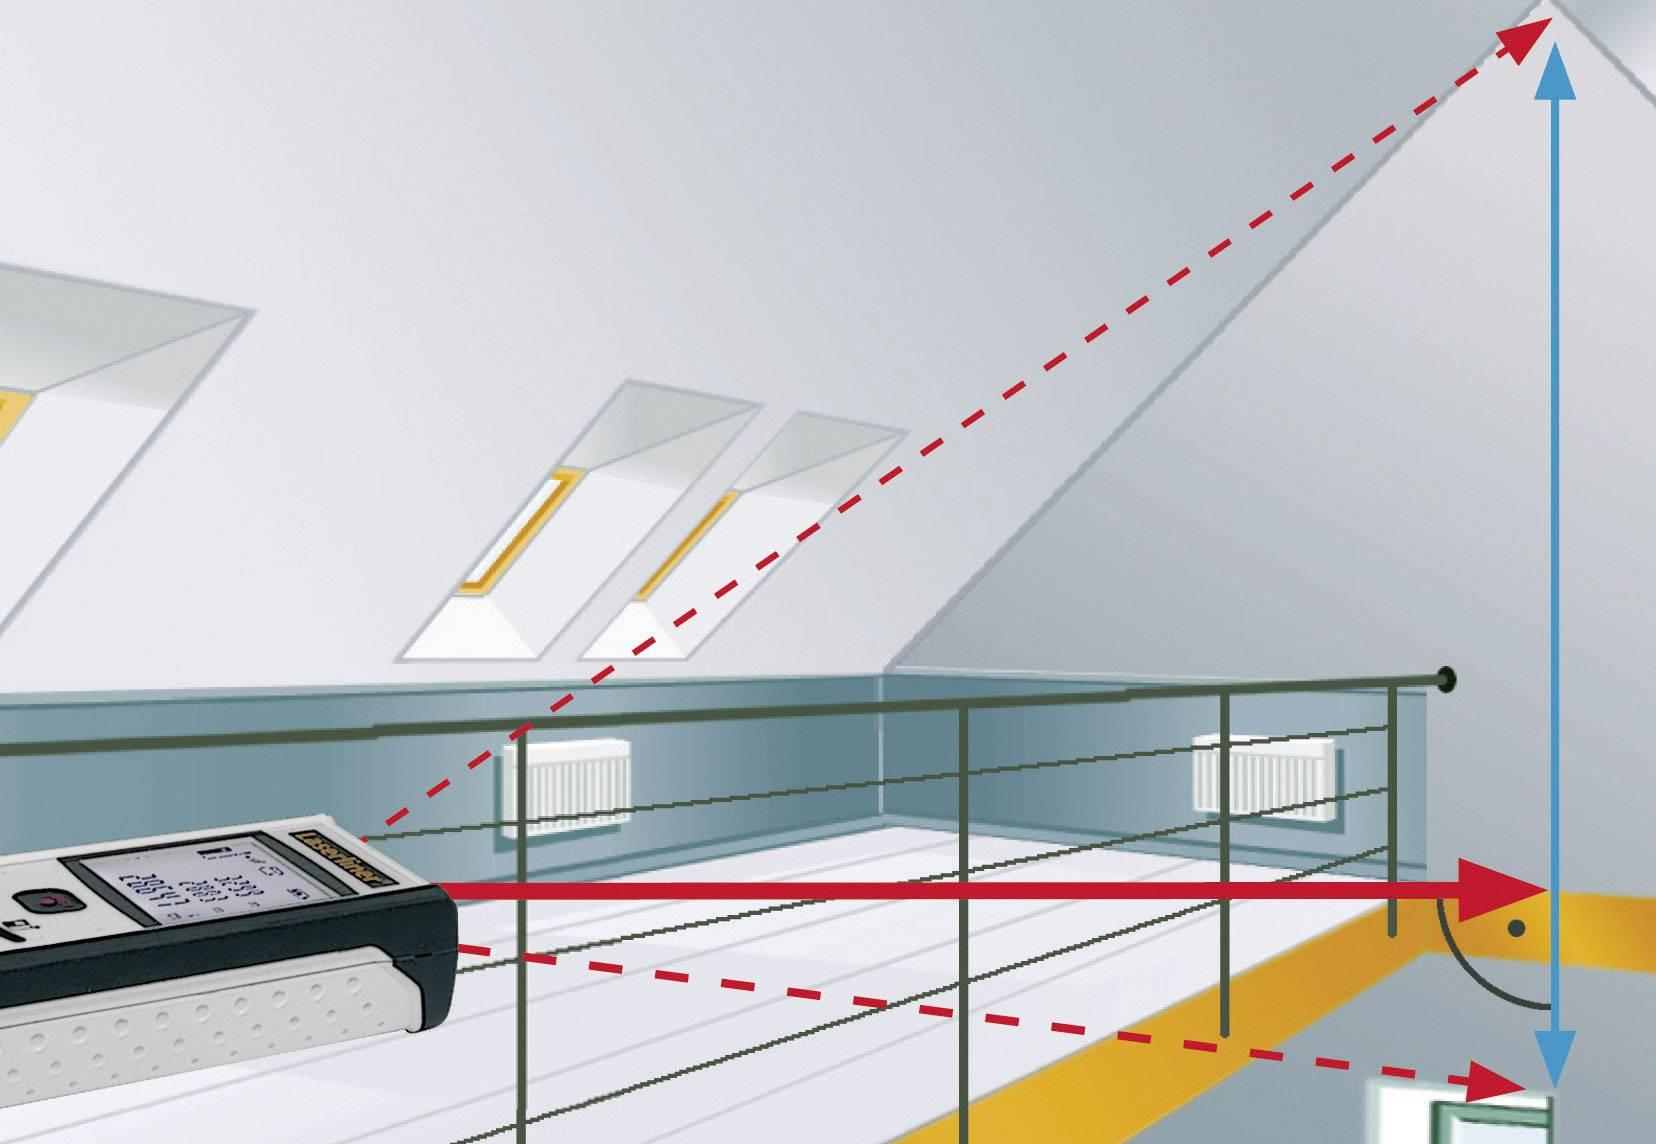 Laser Entfernungsmesser Ultraschall : Laserliner pocket laser entfernungsmesser messbereich max m